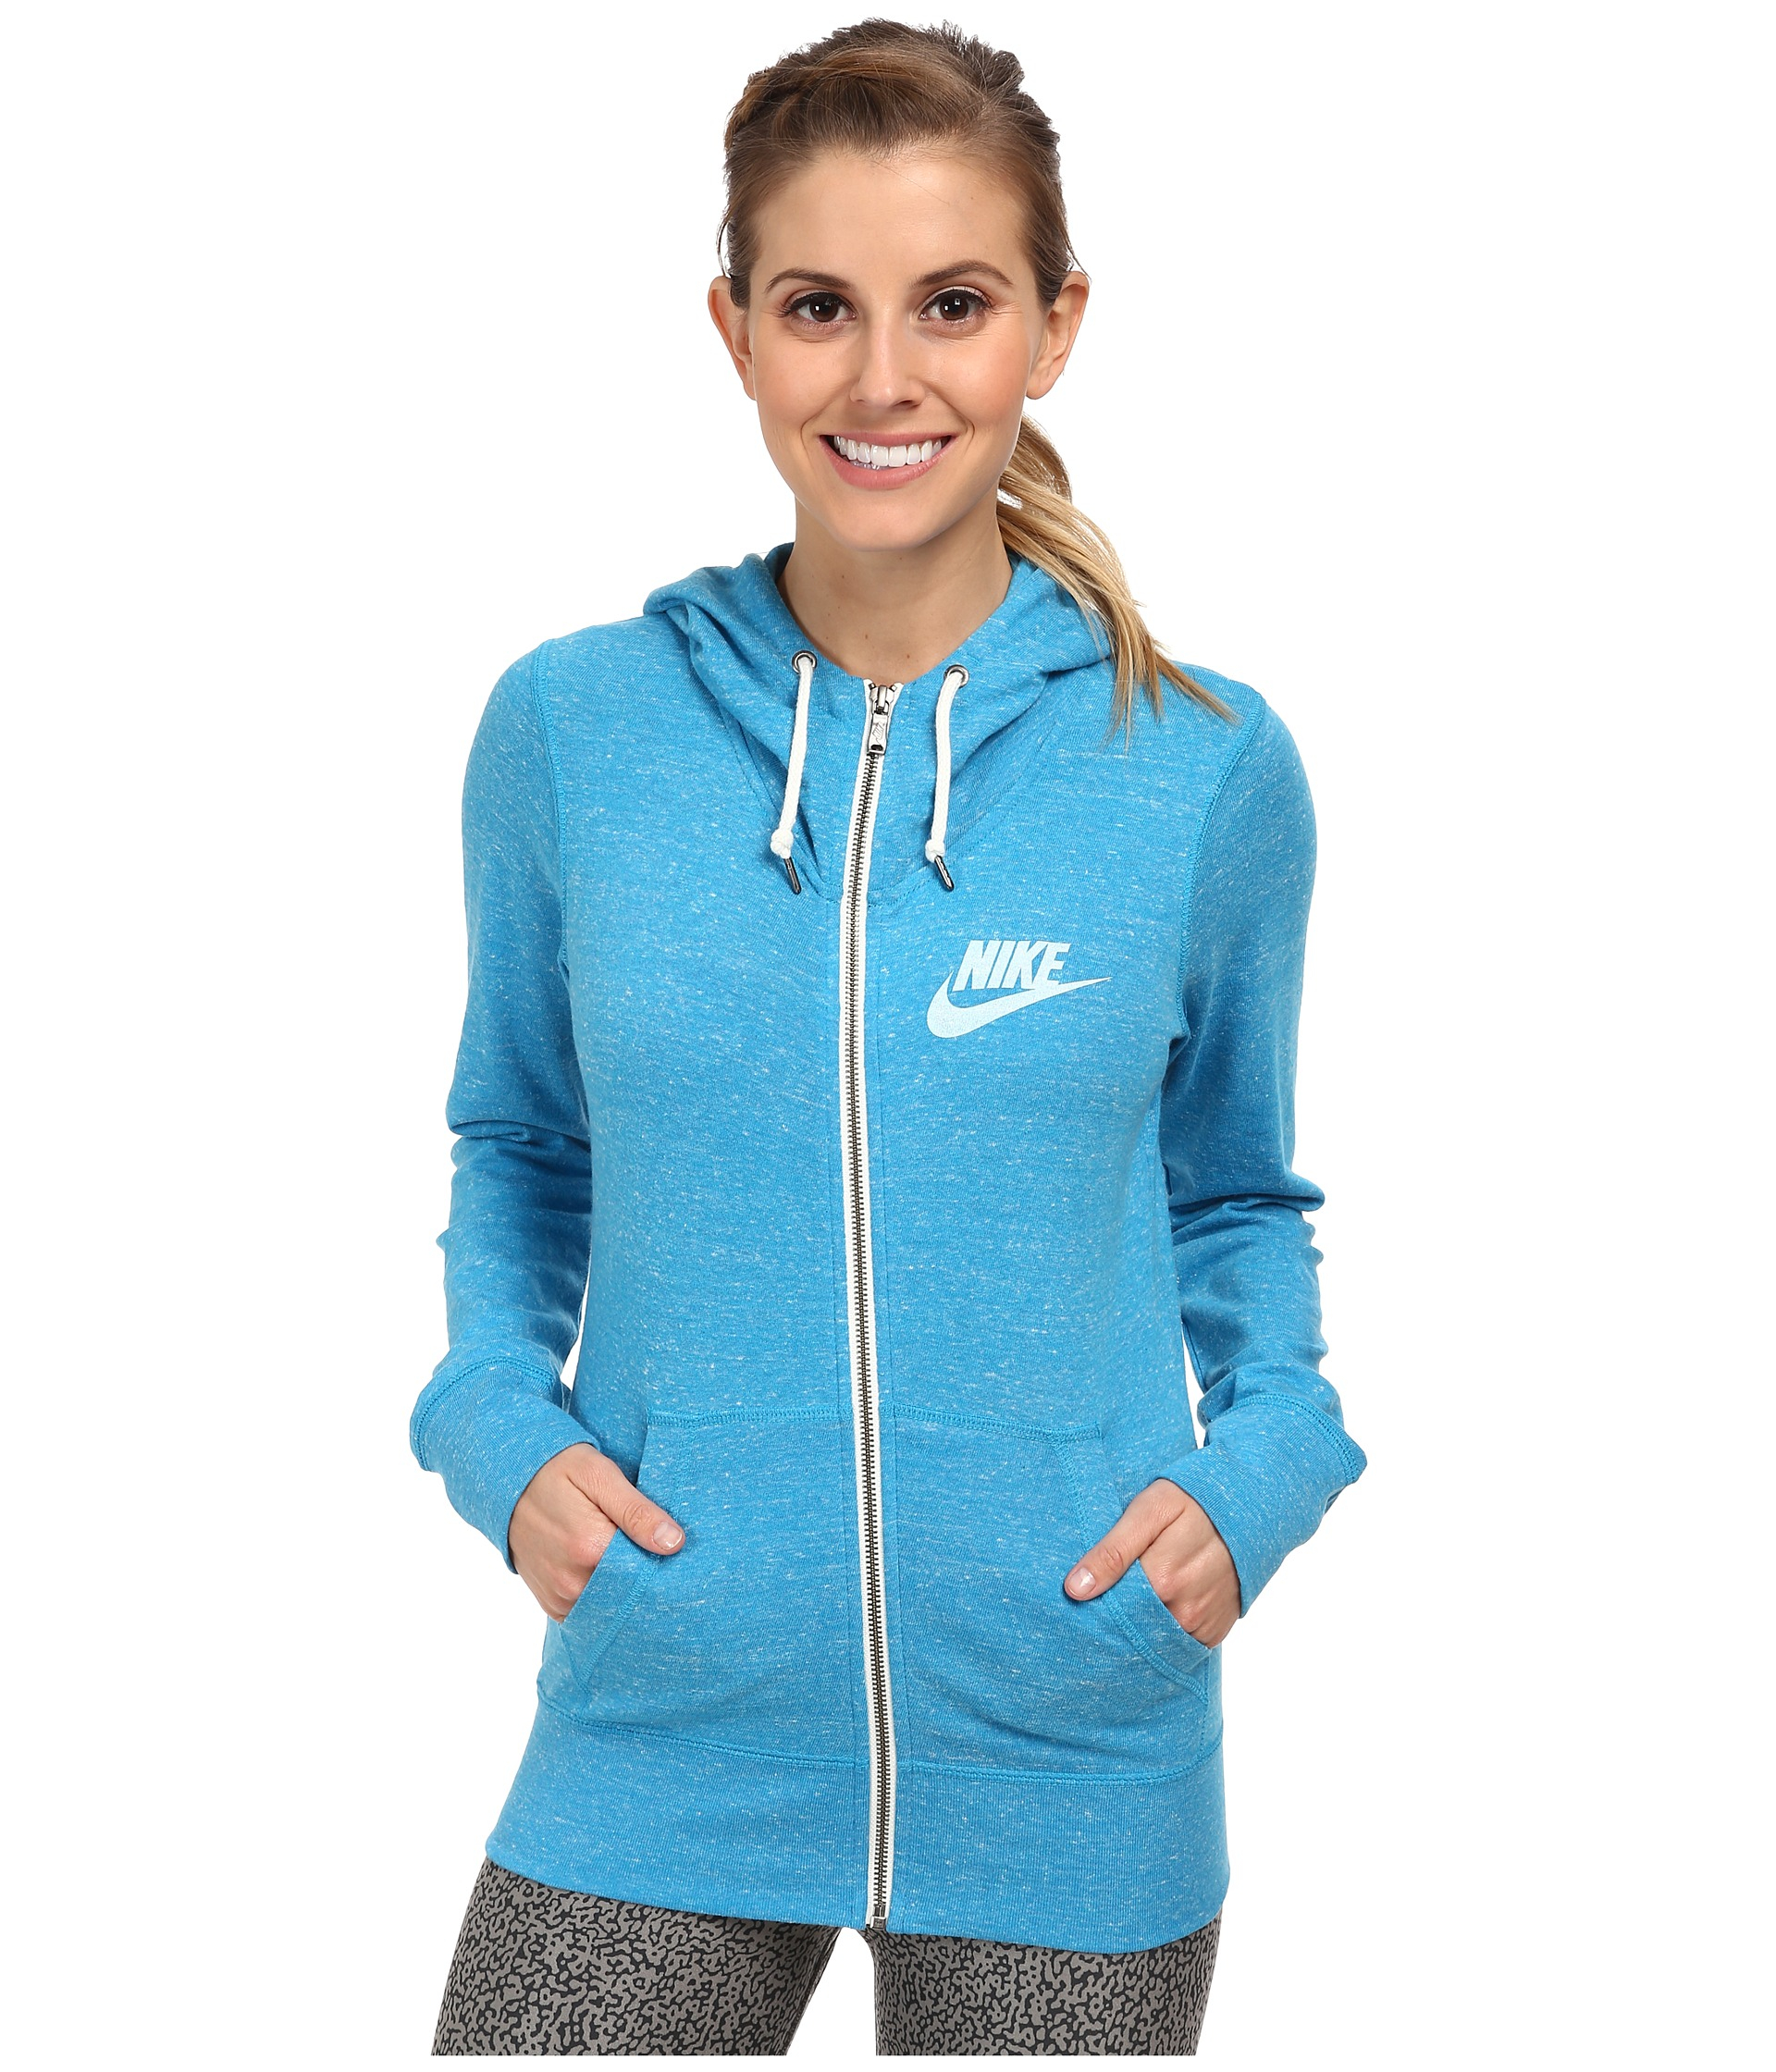 e6aa9f6a5db7 Lyst - Nike Gym Vintage Full-Zip Hoodie in Blue